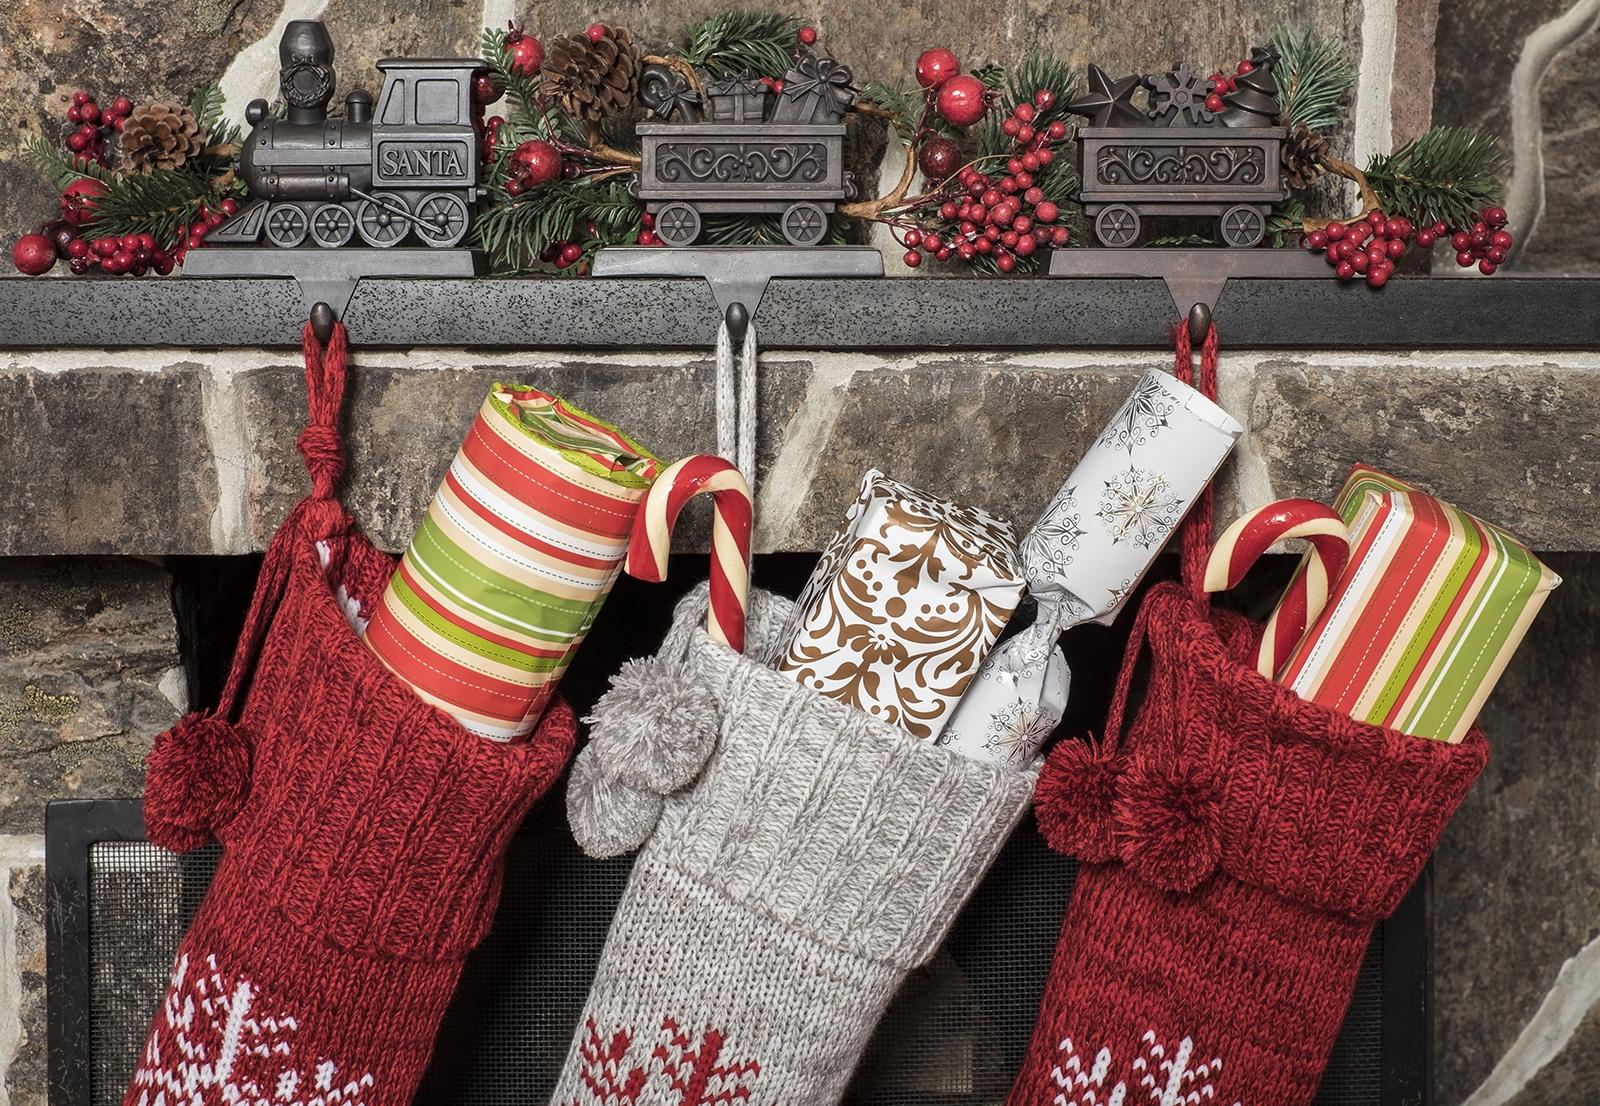 Ask Your Edna Dentist: Christmas Stocking Filler Ideas